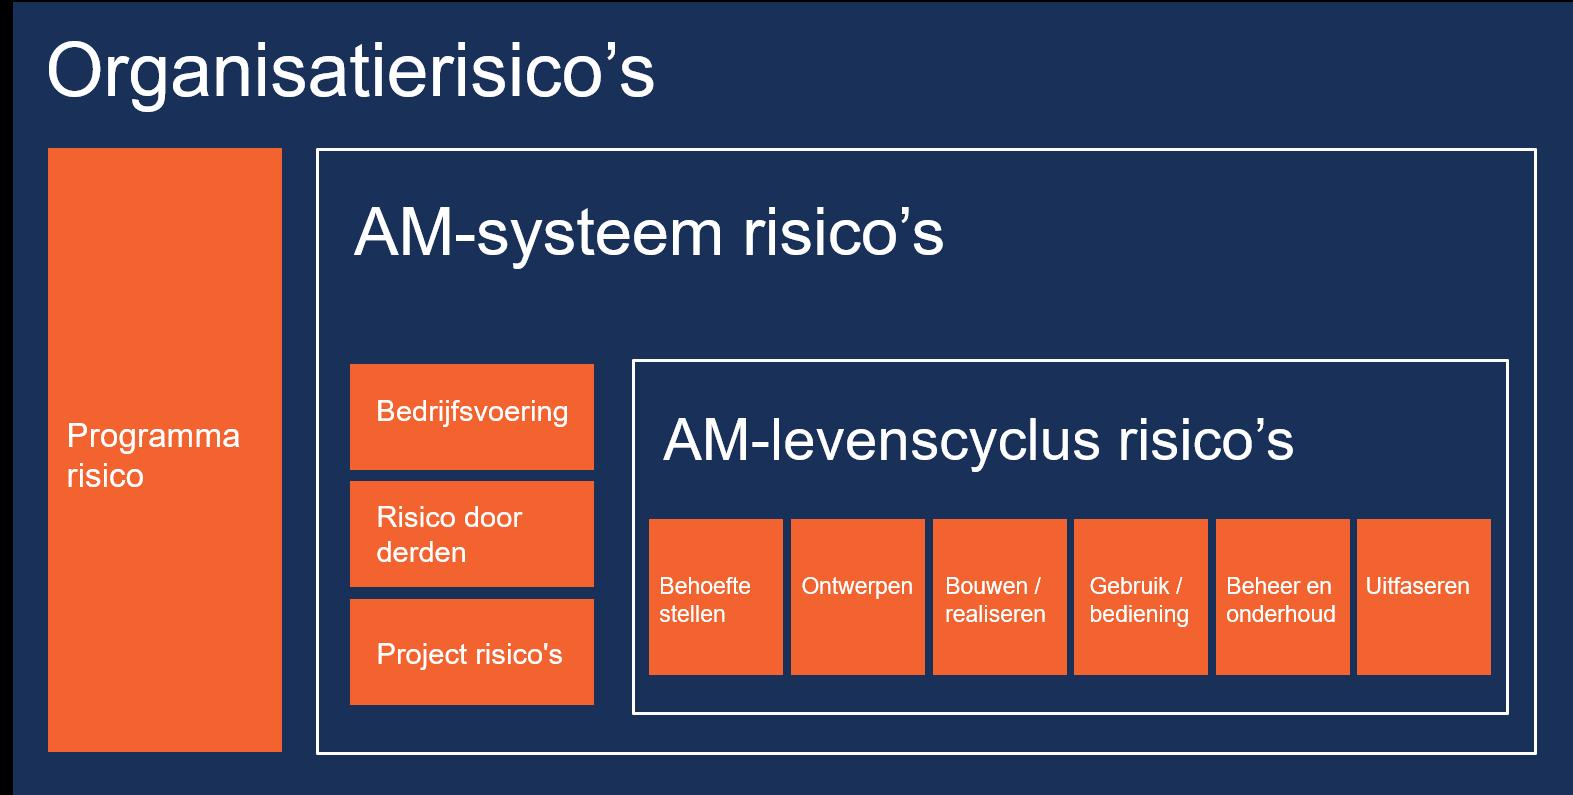 Overzicht van organisatierisico's, assetmanagementrisico's en AM levenscyclus risico's